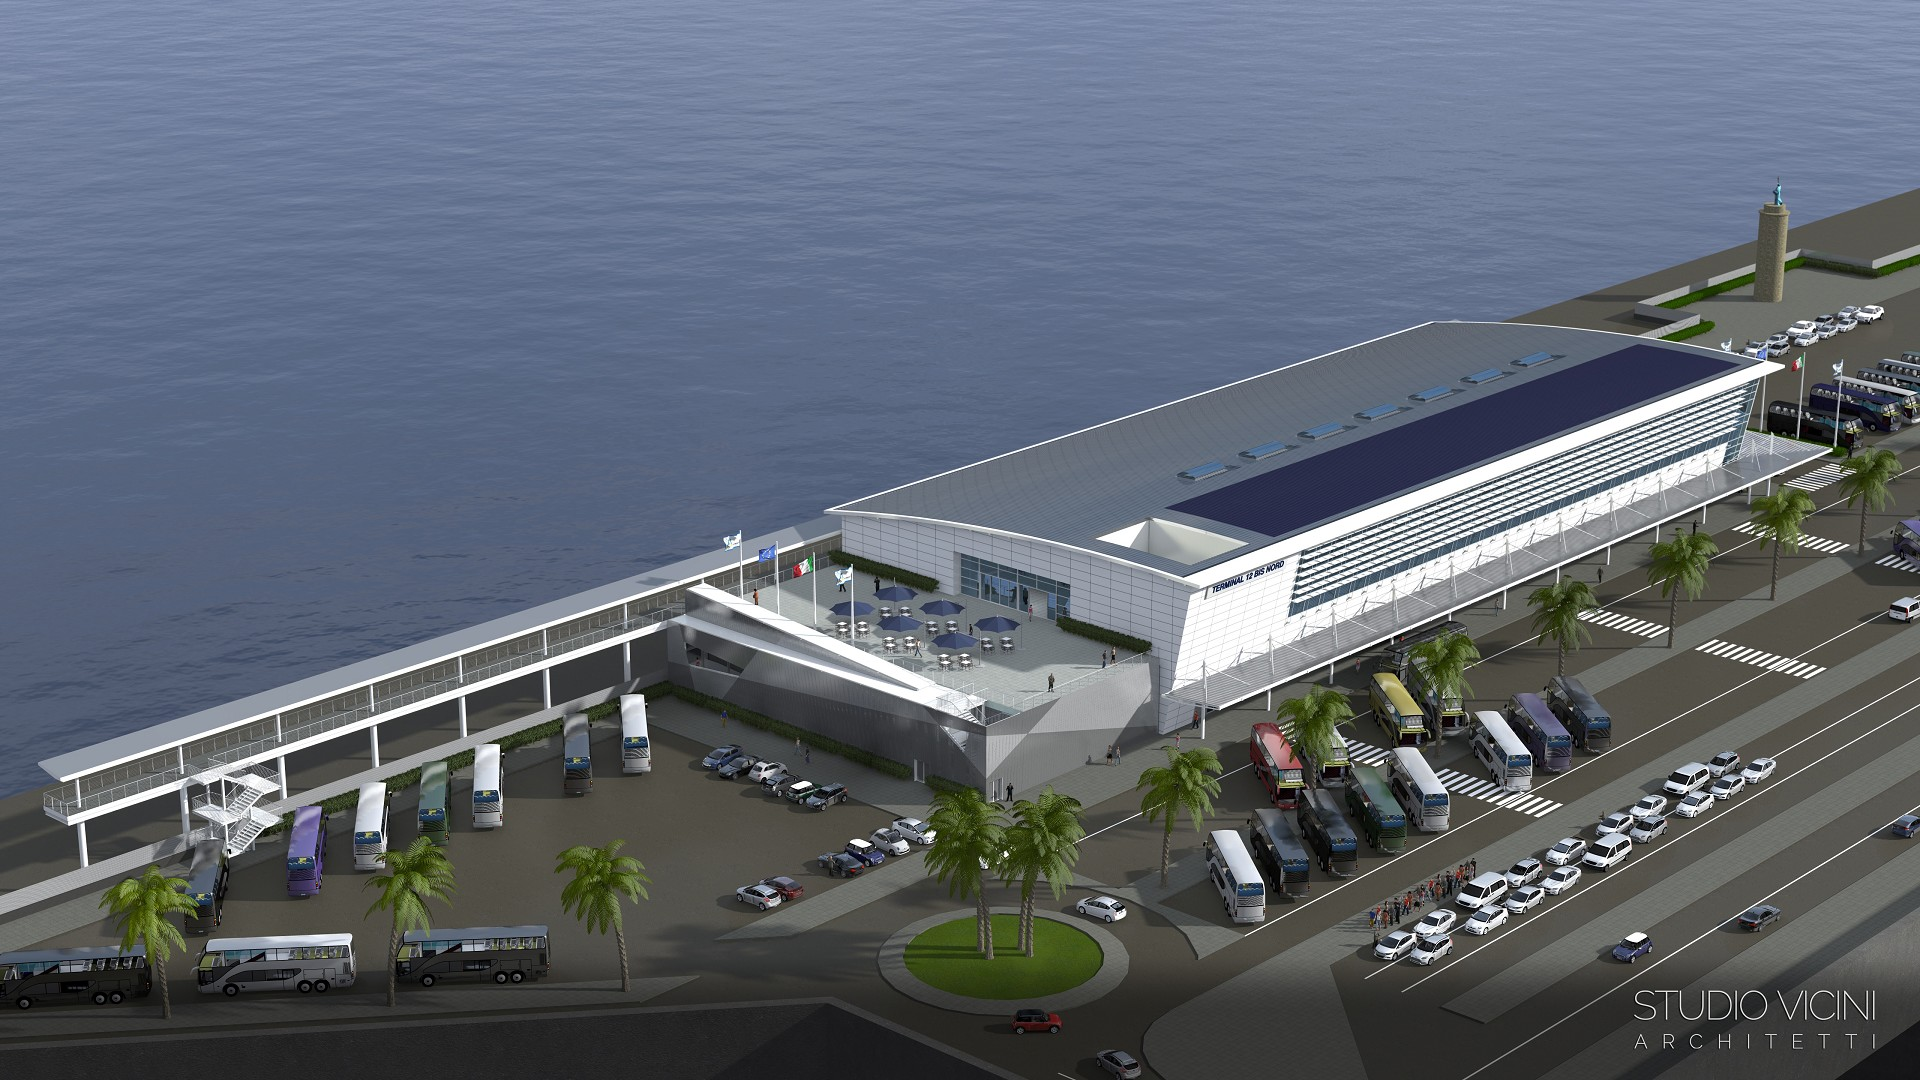 Studio vicini civitavecchia terminal autorit portauale - Port of civitavecchia cruise terminal ...